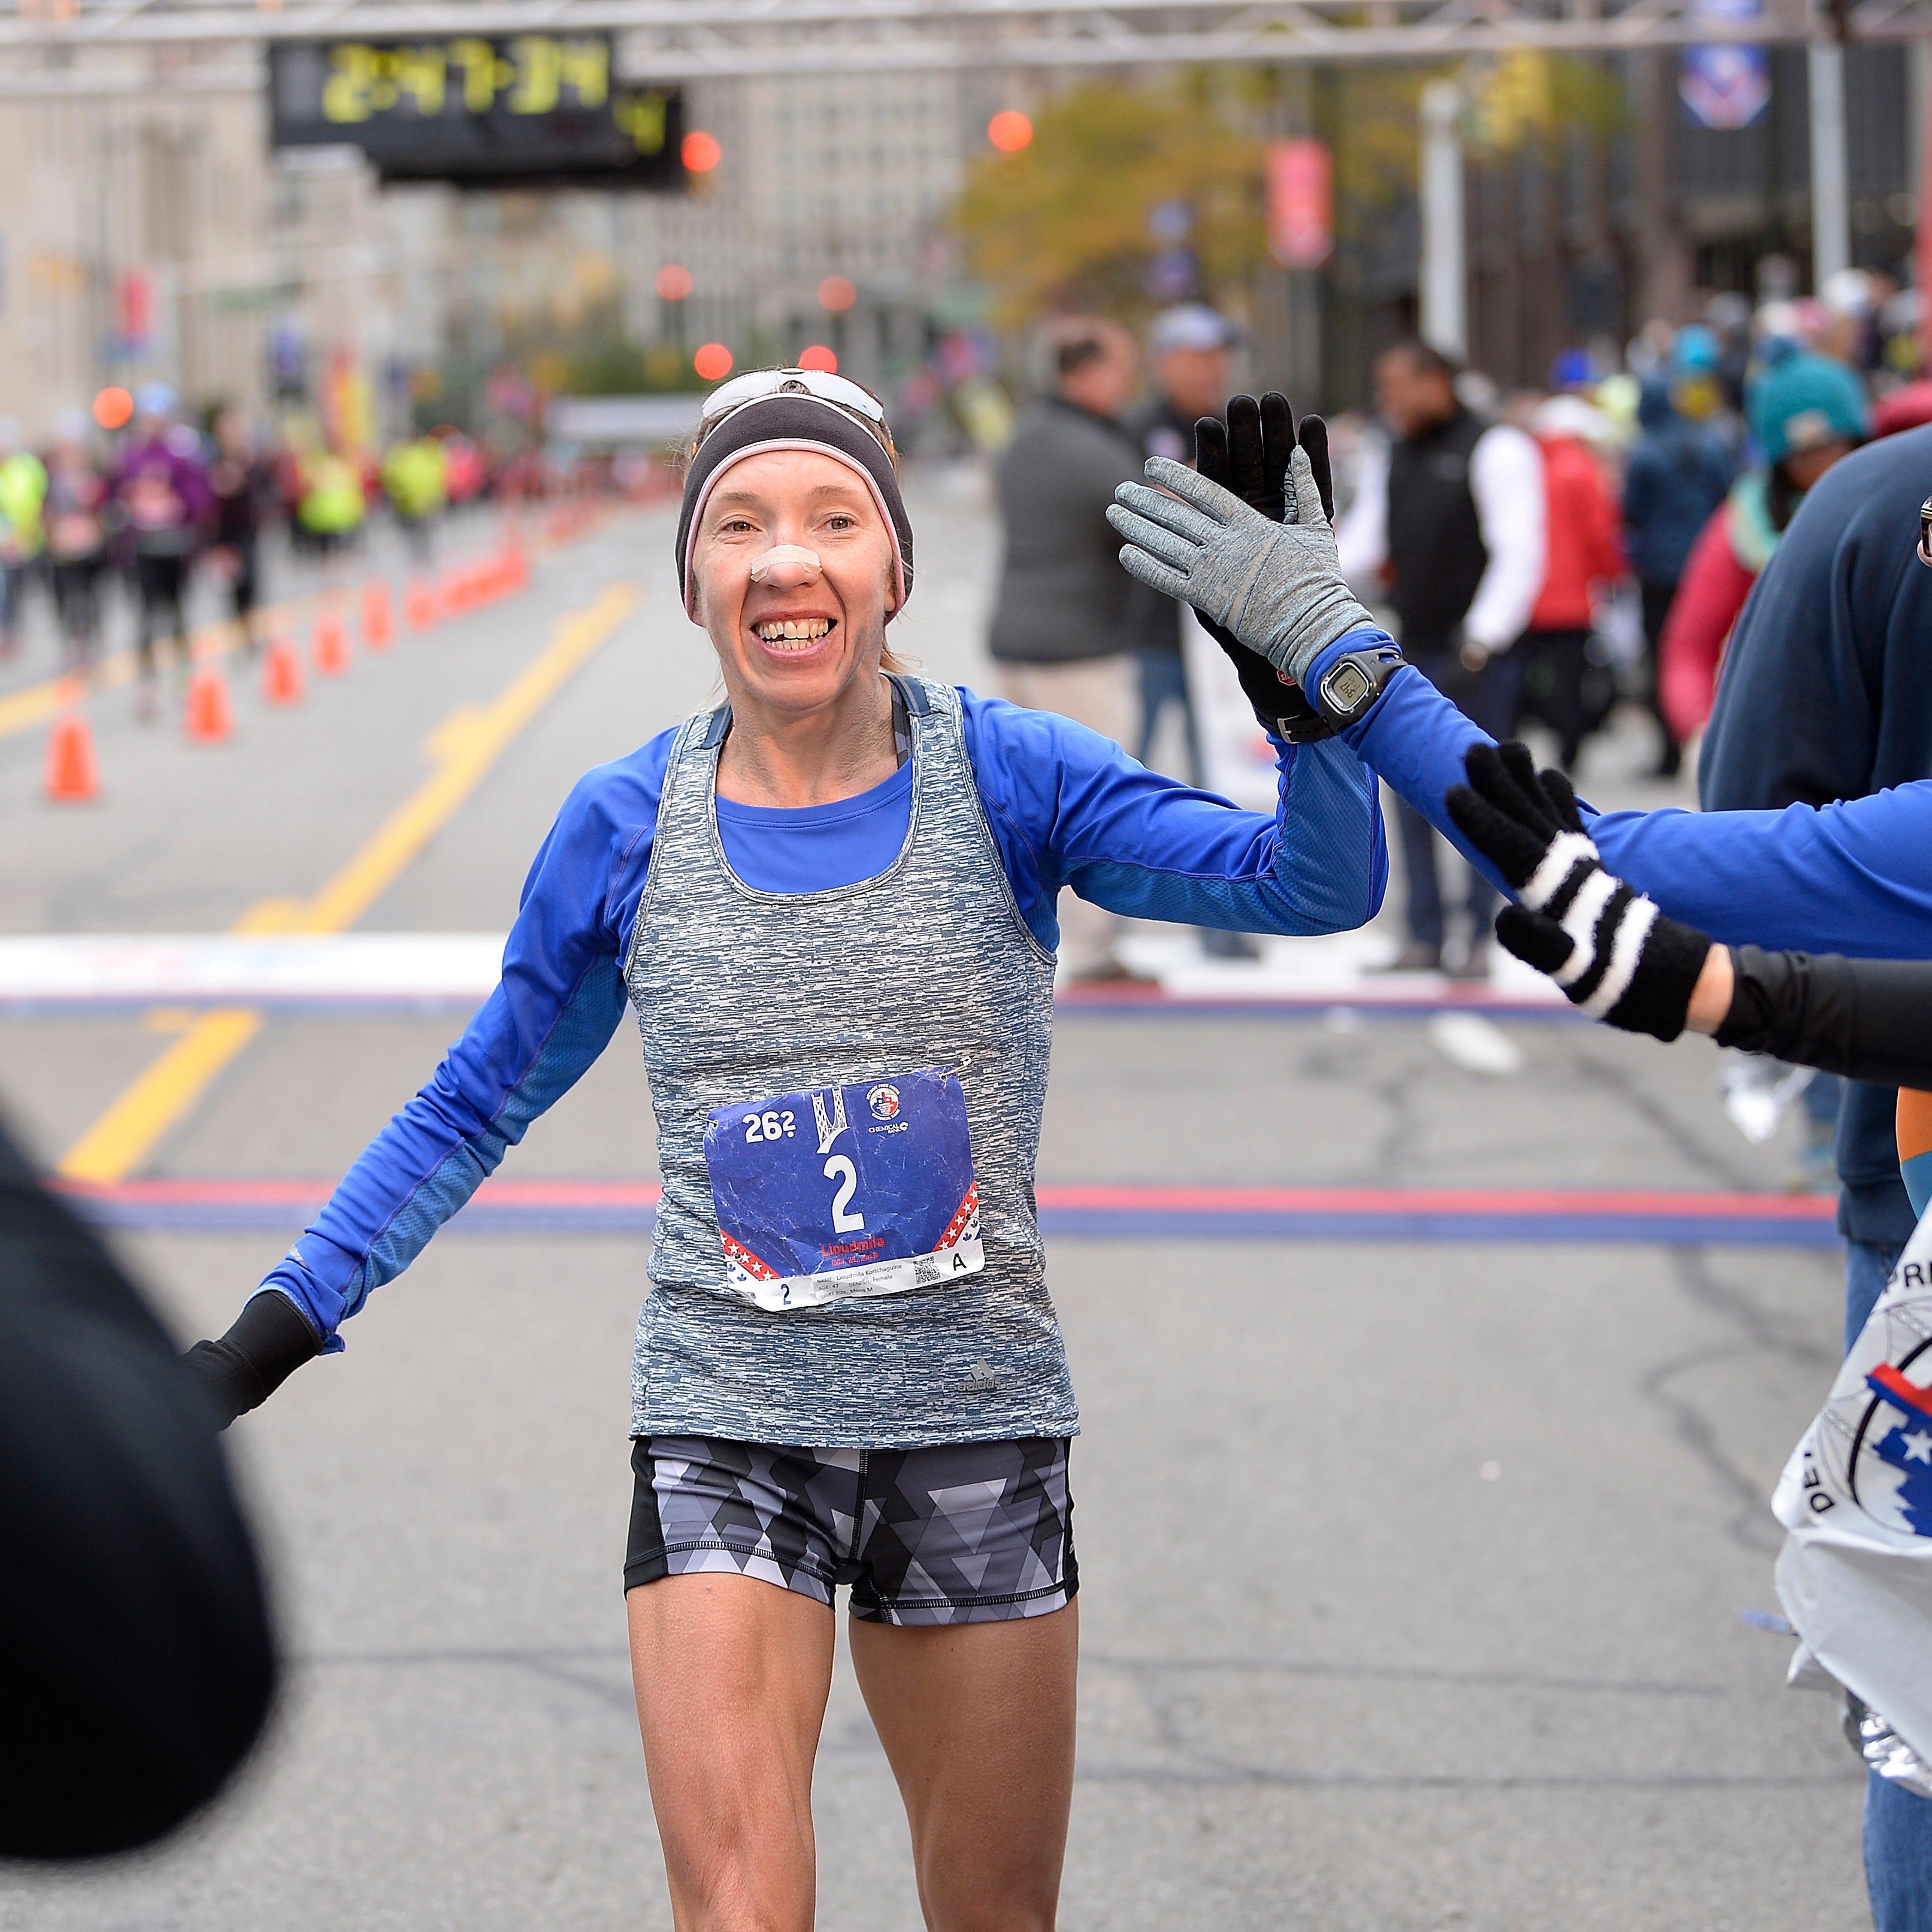 Cool temps suit Detroit marathon winners Chipsiya, Kortchaguina